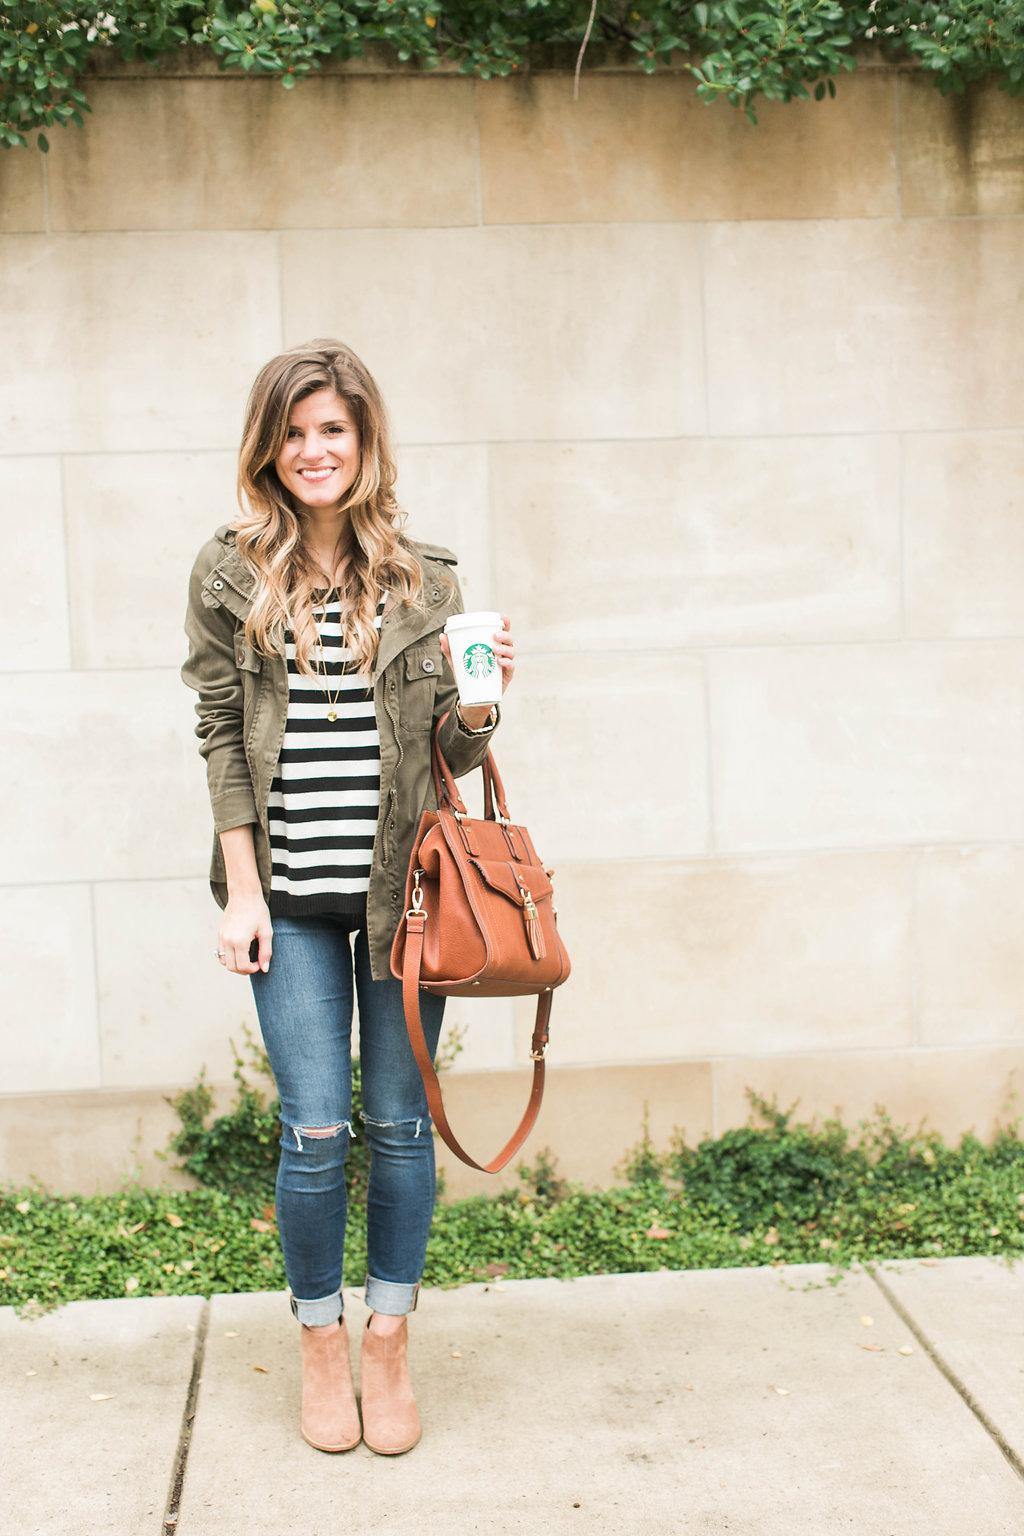 Simple & Cute Fall Outfit Idea - Stripes + Cognac + Green ...